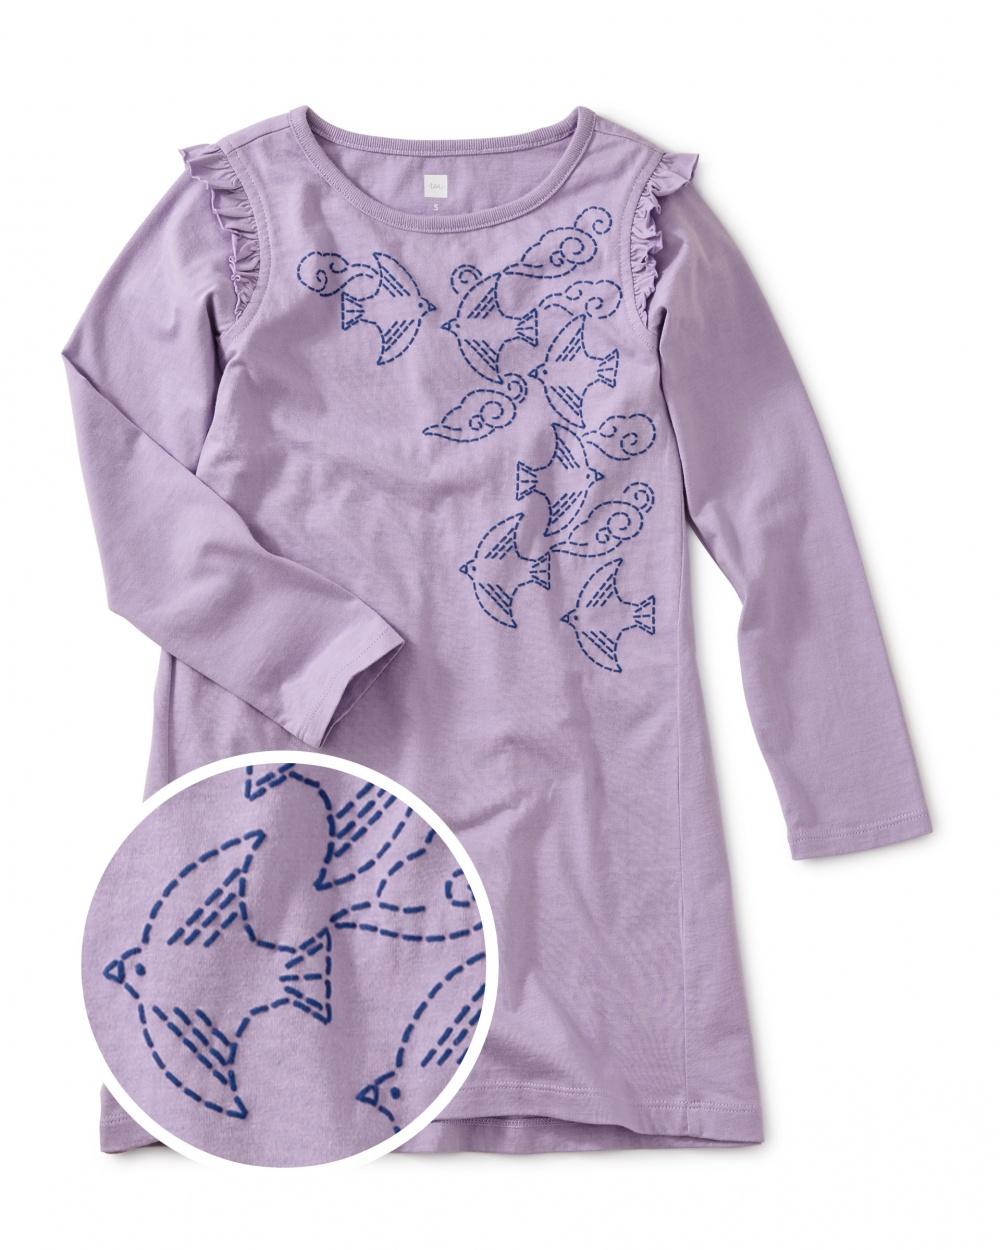 Graceful Ravens Graphic Dress